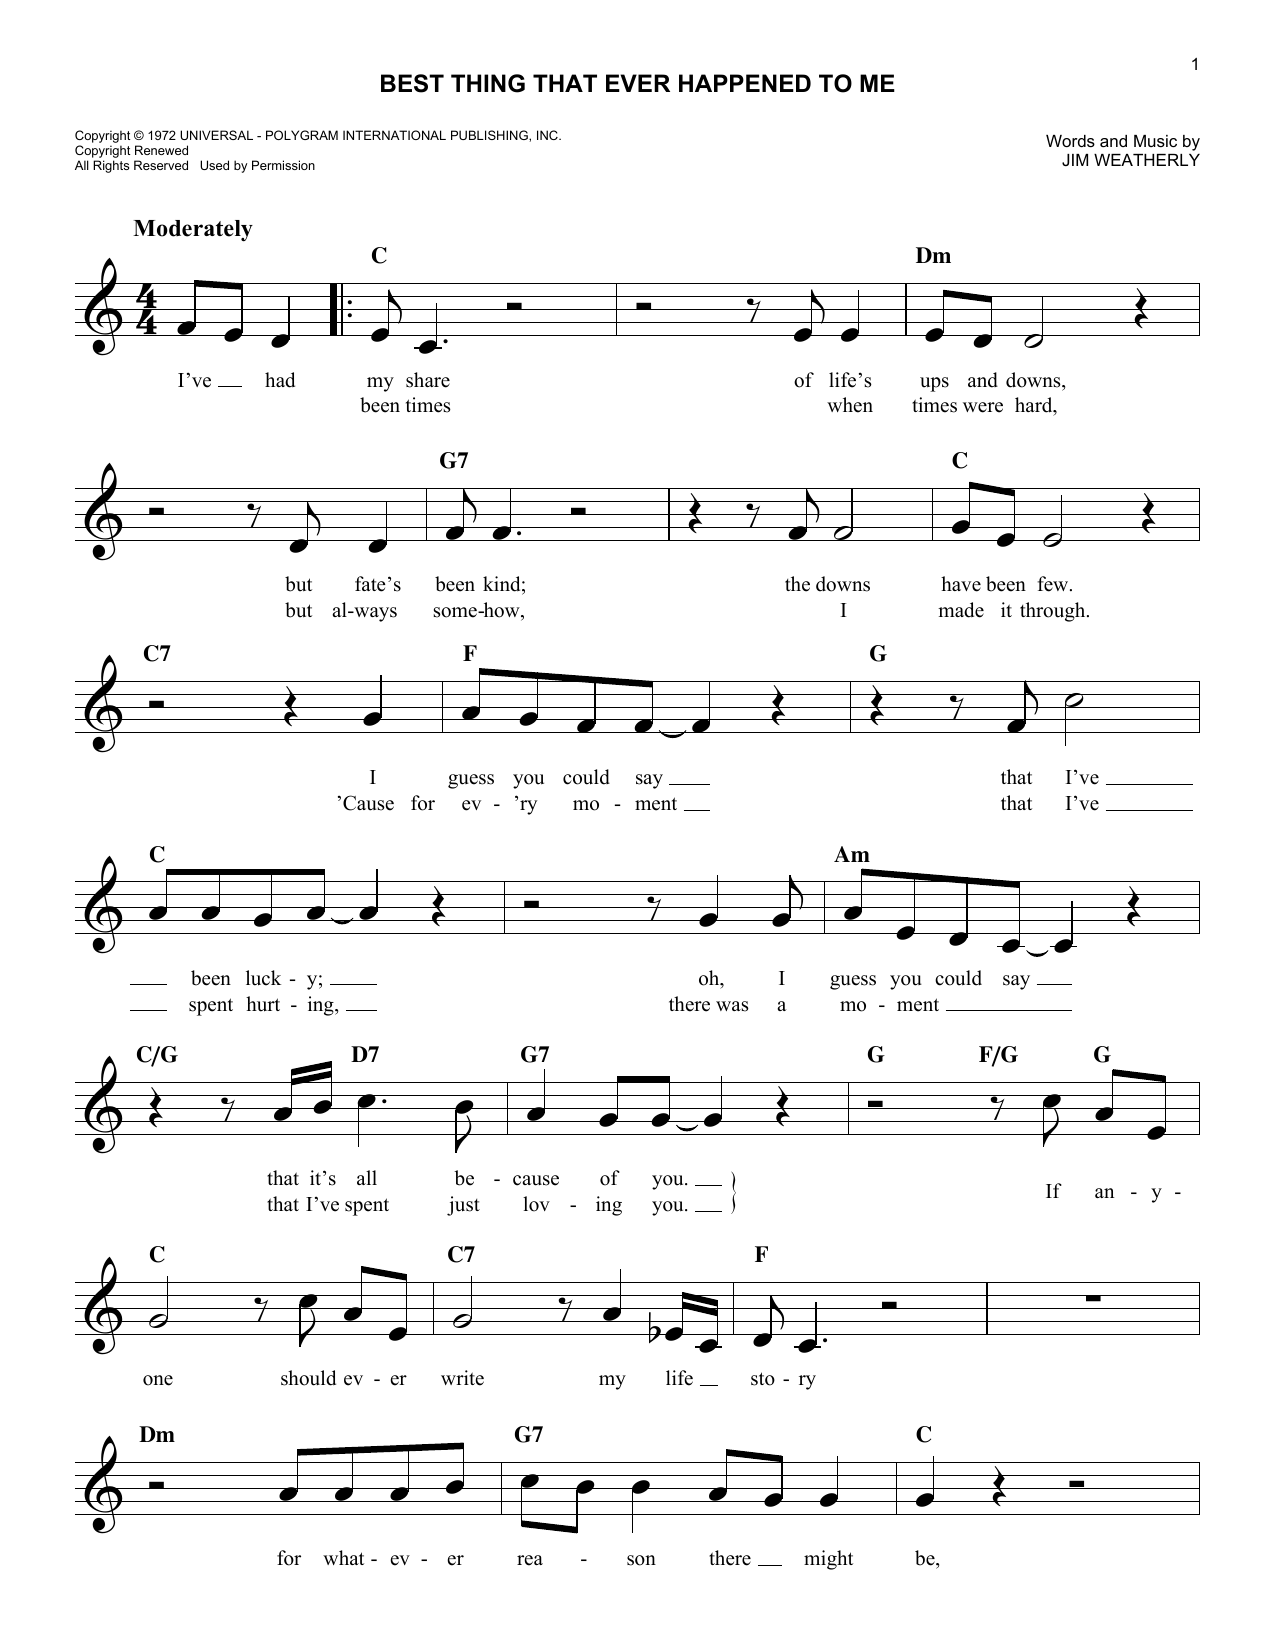 Sheet Music Digital Files To Print Licensed Jim Weatherly Digital